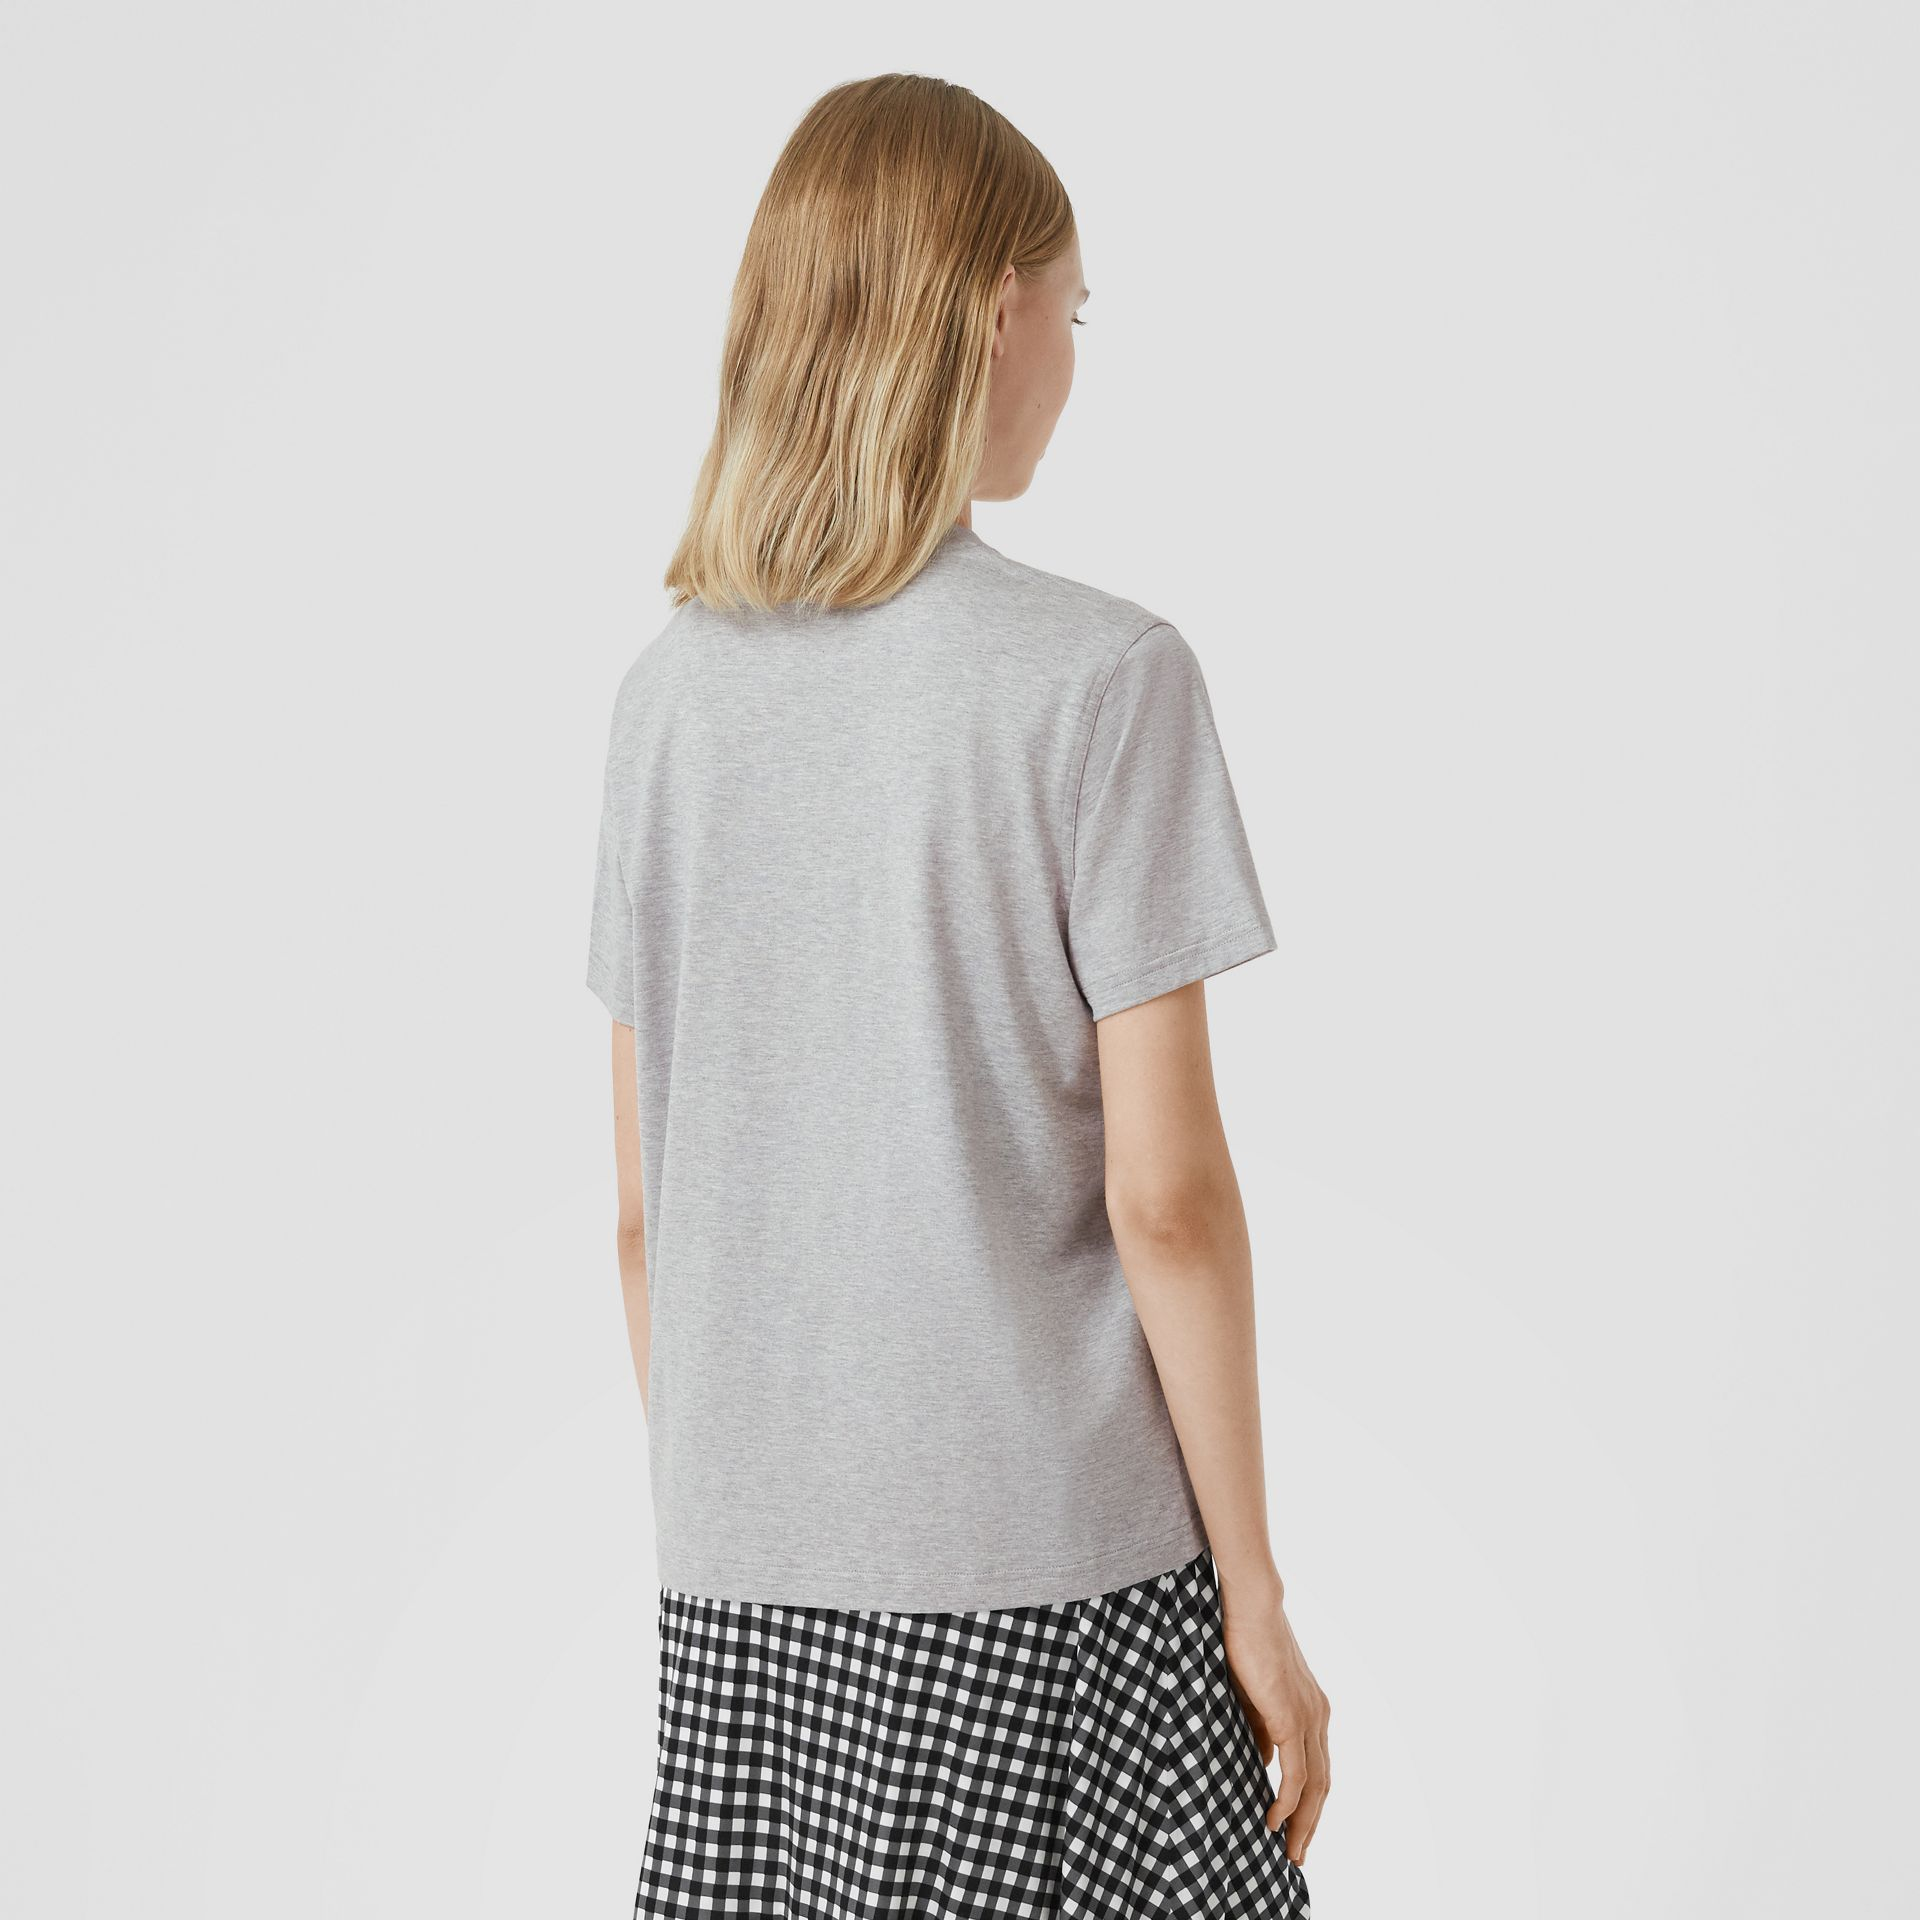 Monogram Motif Cotton T-shirt in Pale Grey Melange - Women | Burberry United Kingdom - gallery image 2